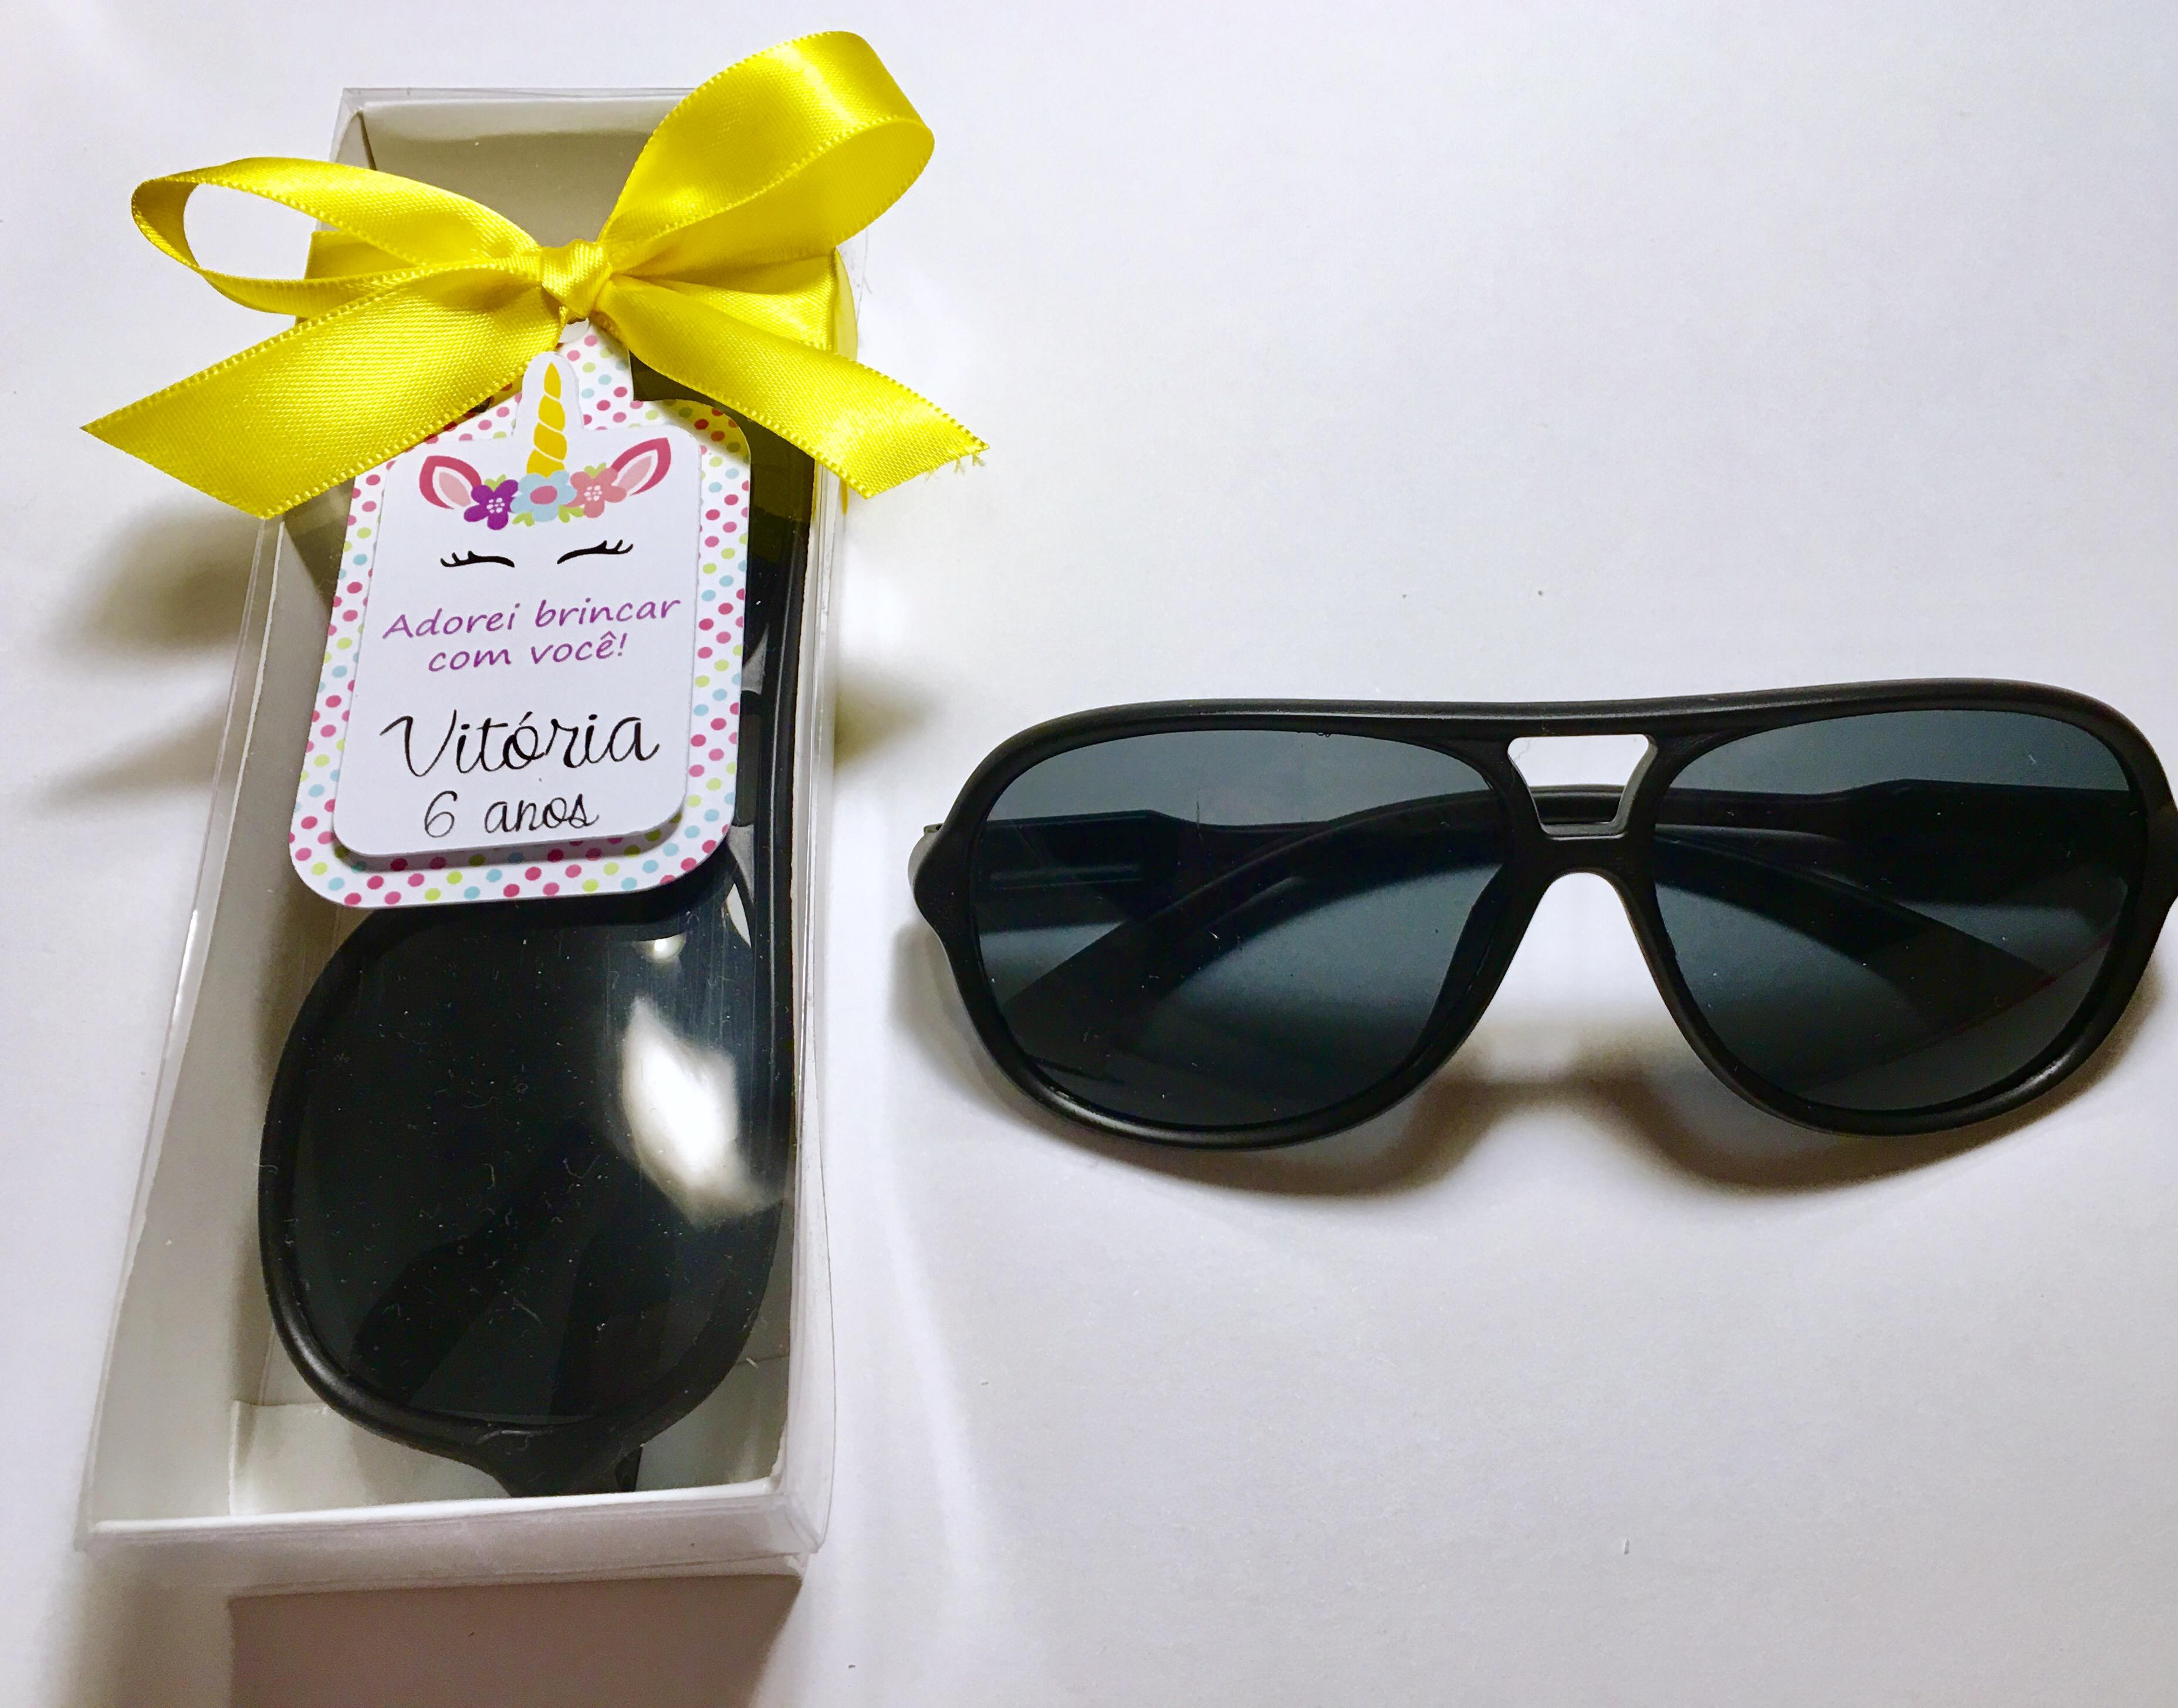 6e08b8aaa Lembrança óculos escuros infantil festa Unicornio no Elo7   rakiroze  (AEA9F9)